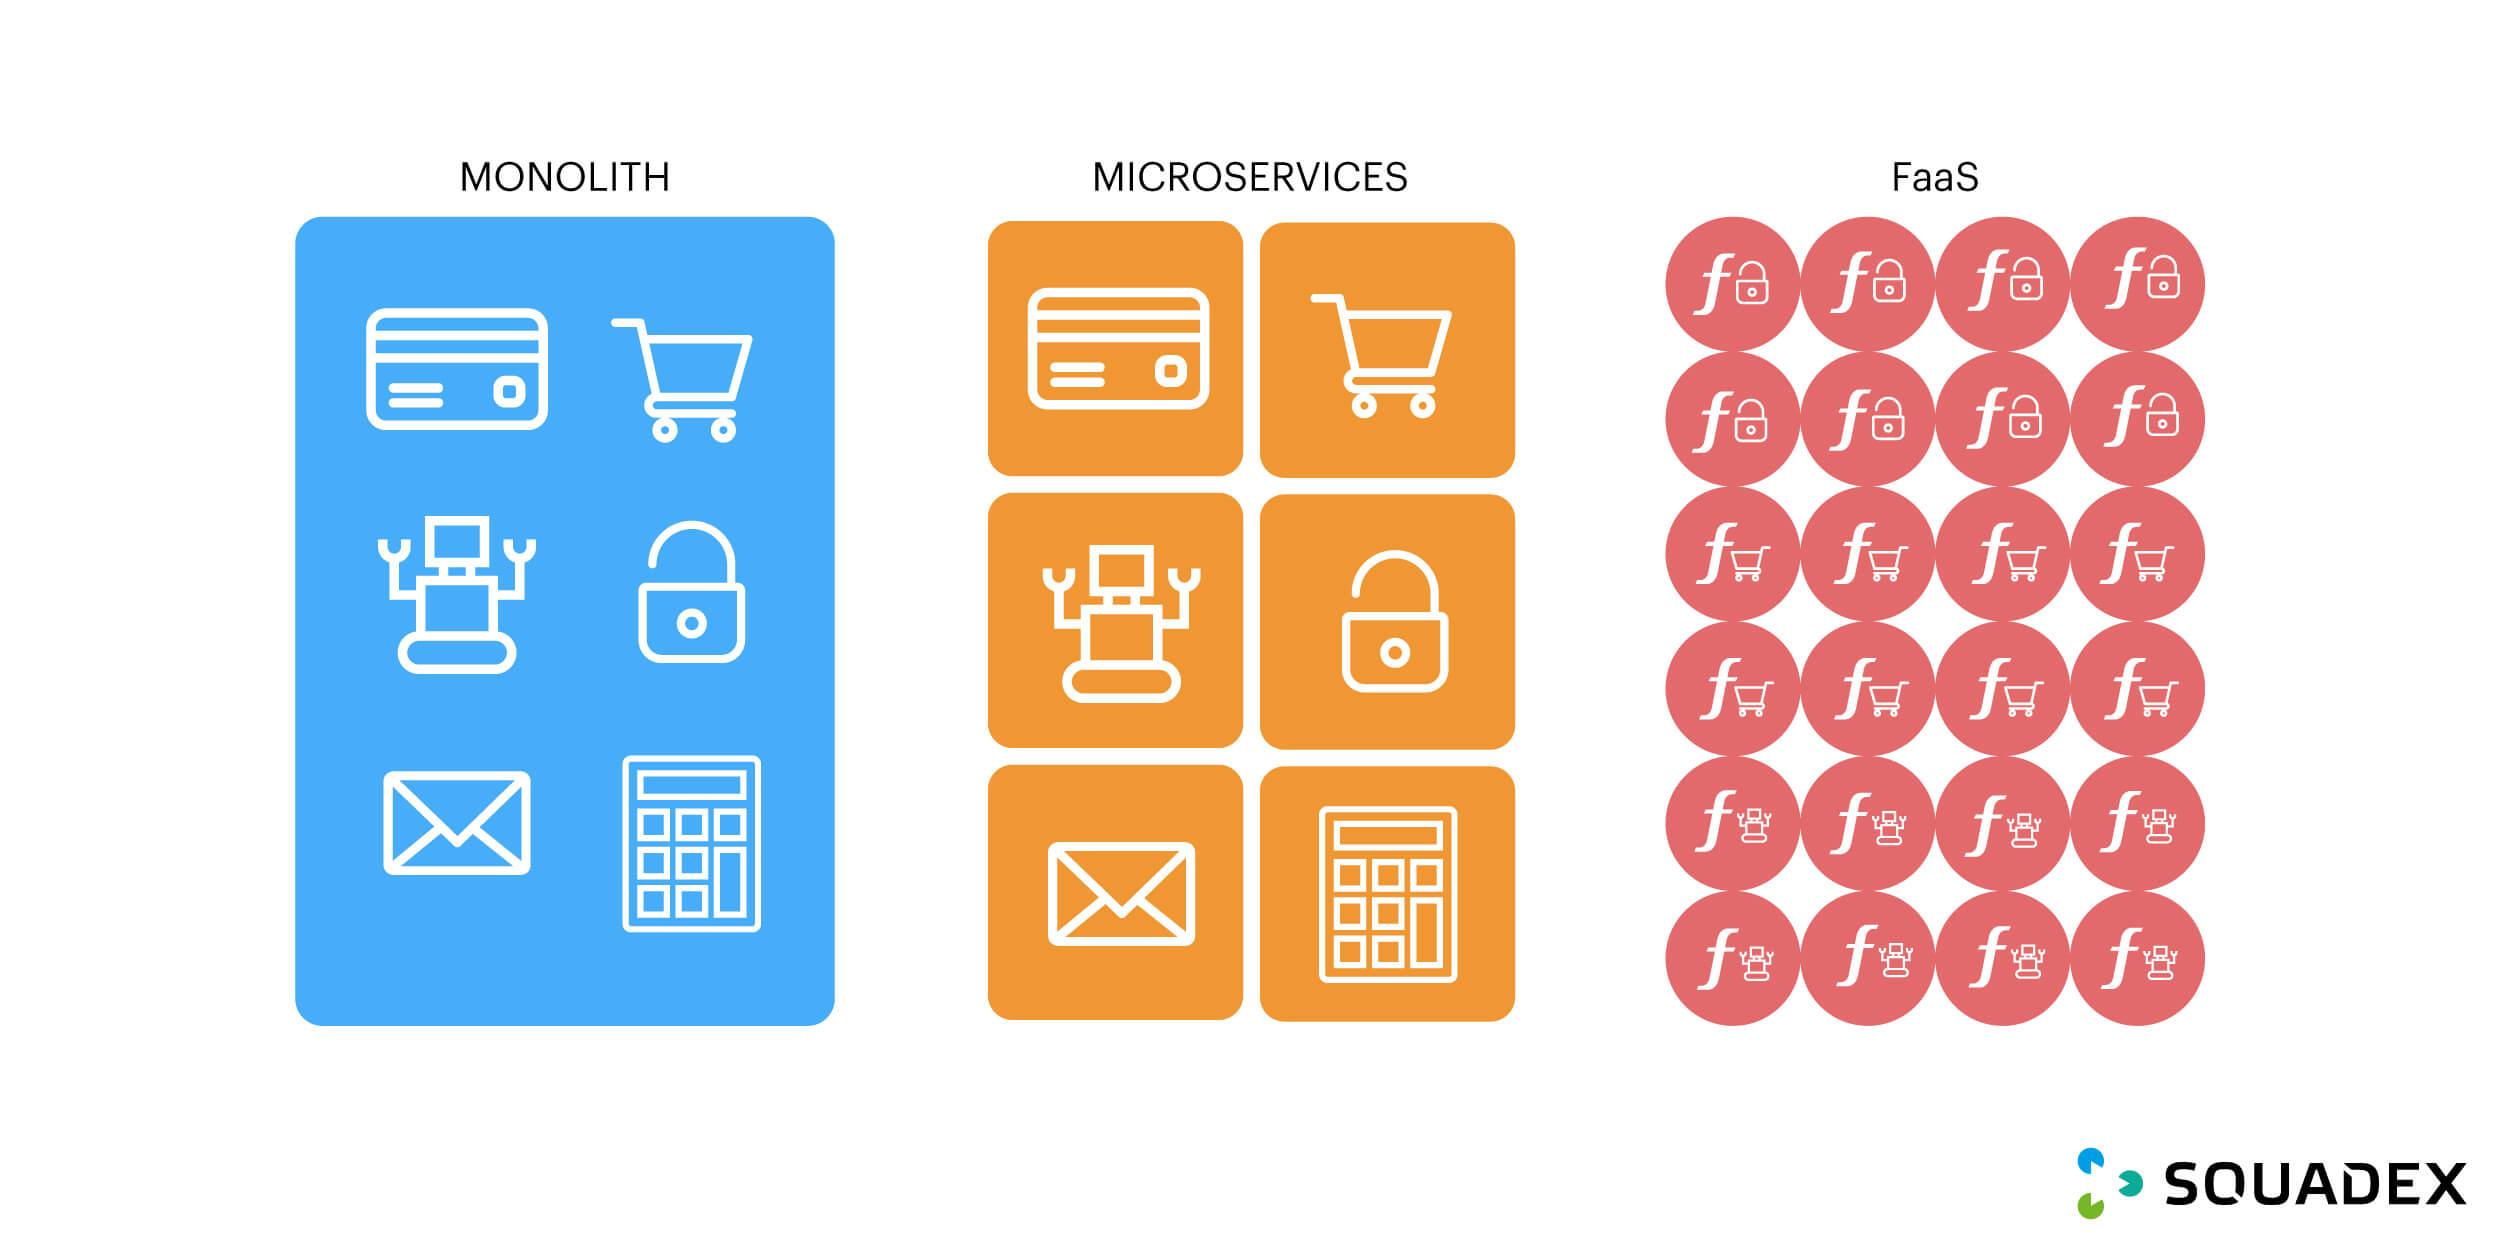 Monolithic vs Microservices vs FaaS structure